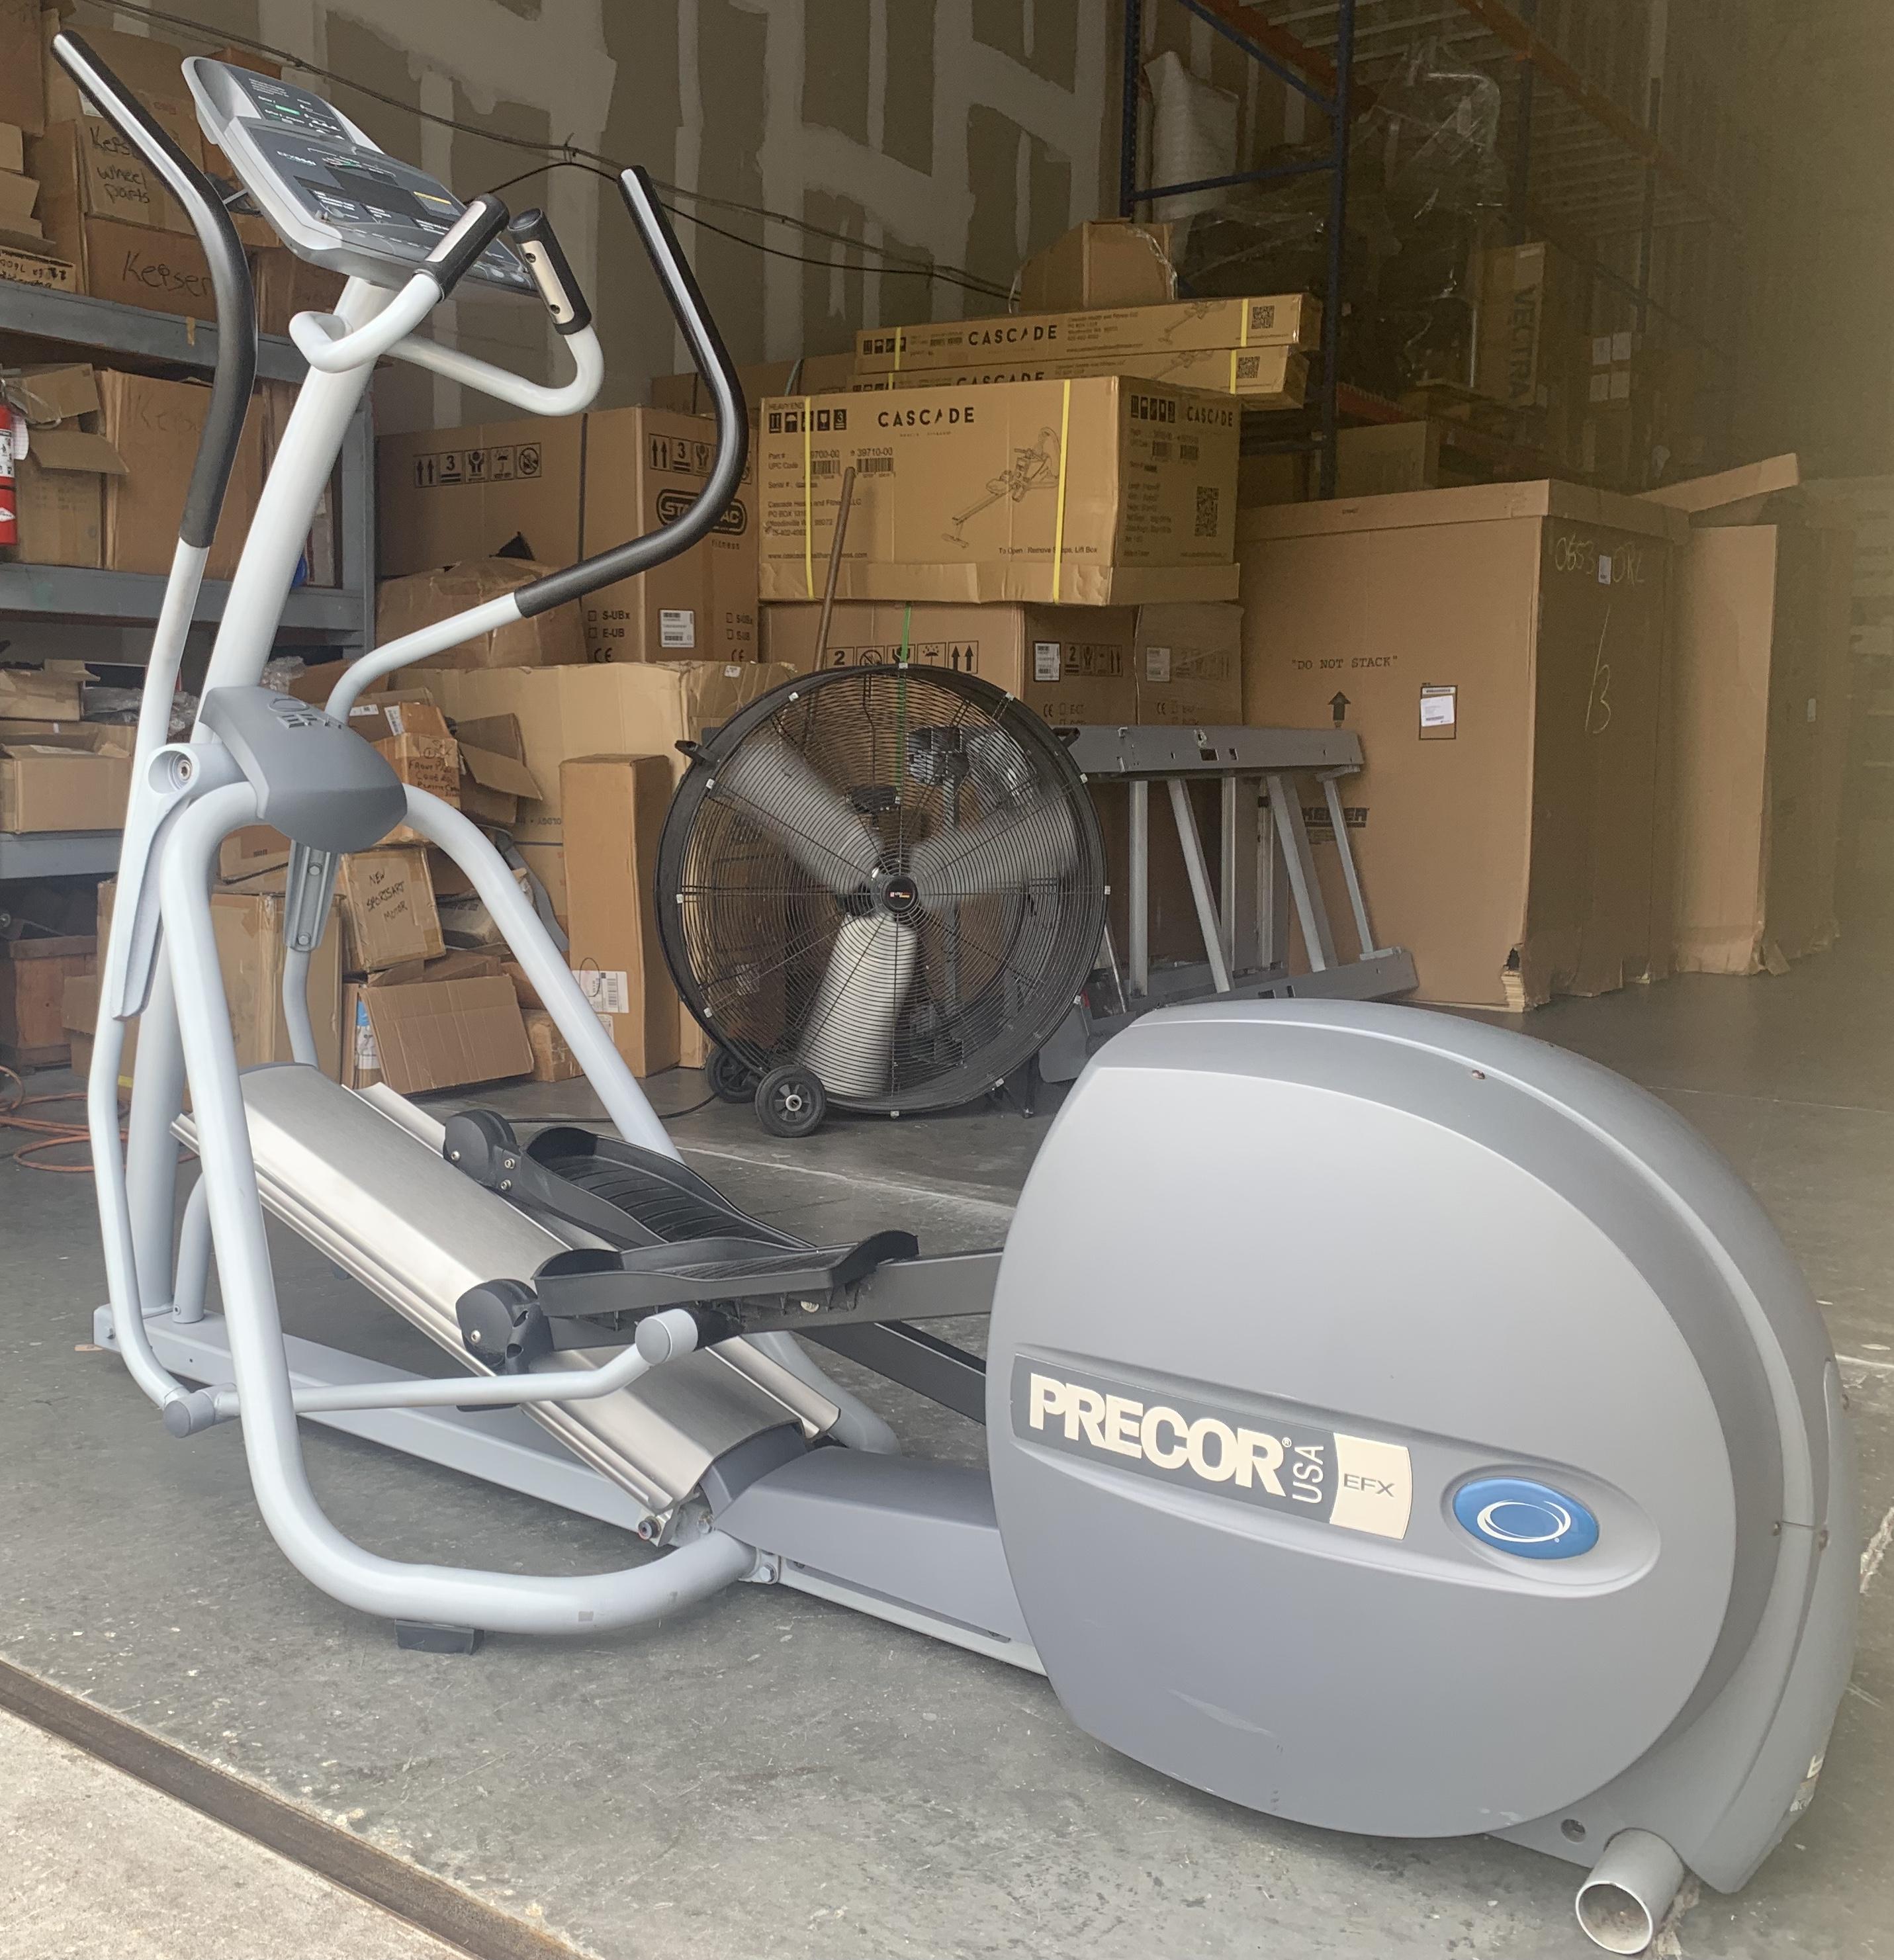 Precor Fitness EFX554I Elliptical CrossTrainer Image